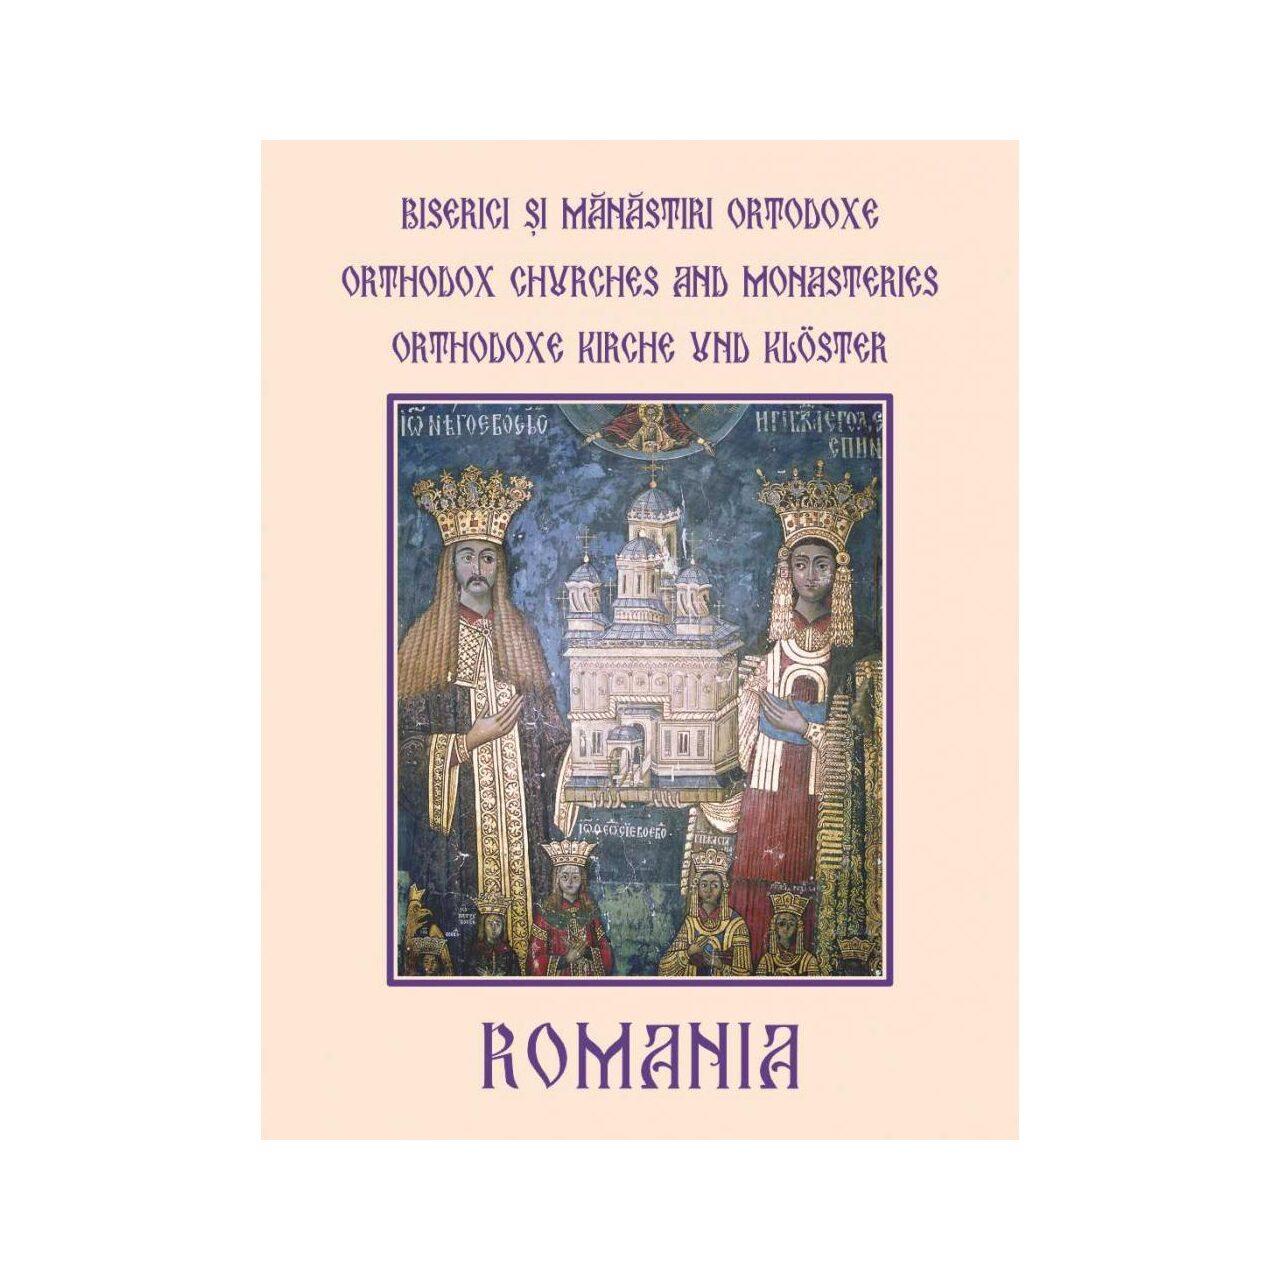 Biserici şi Mănăstiri Ortodoxe din România - Orthodox Churches and Monasteries imagine edituracasa.ro